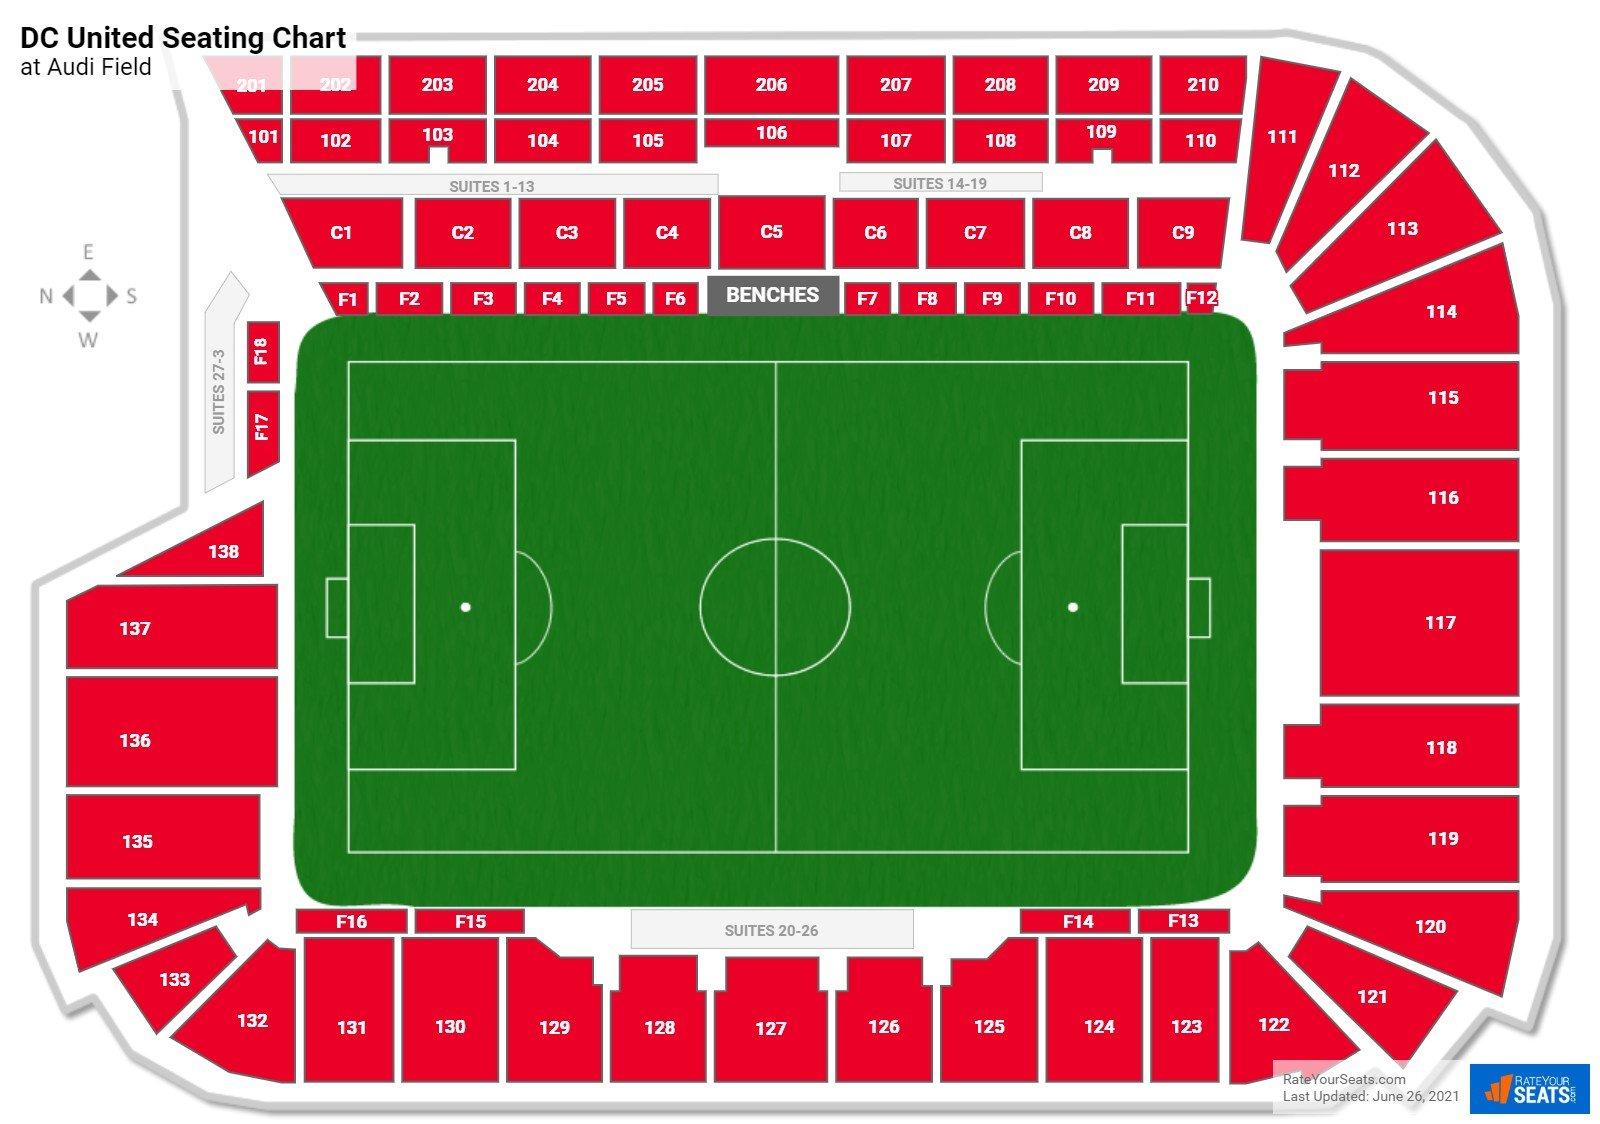 Audi Field DC United Seating Chart